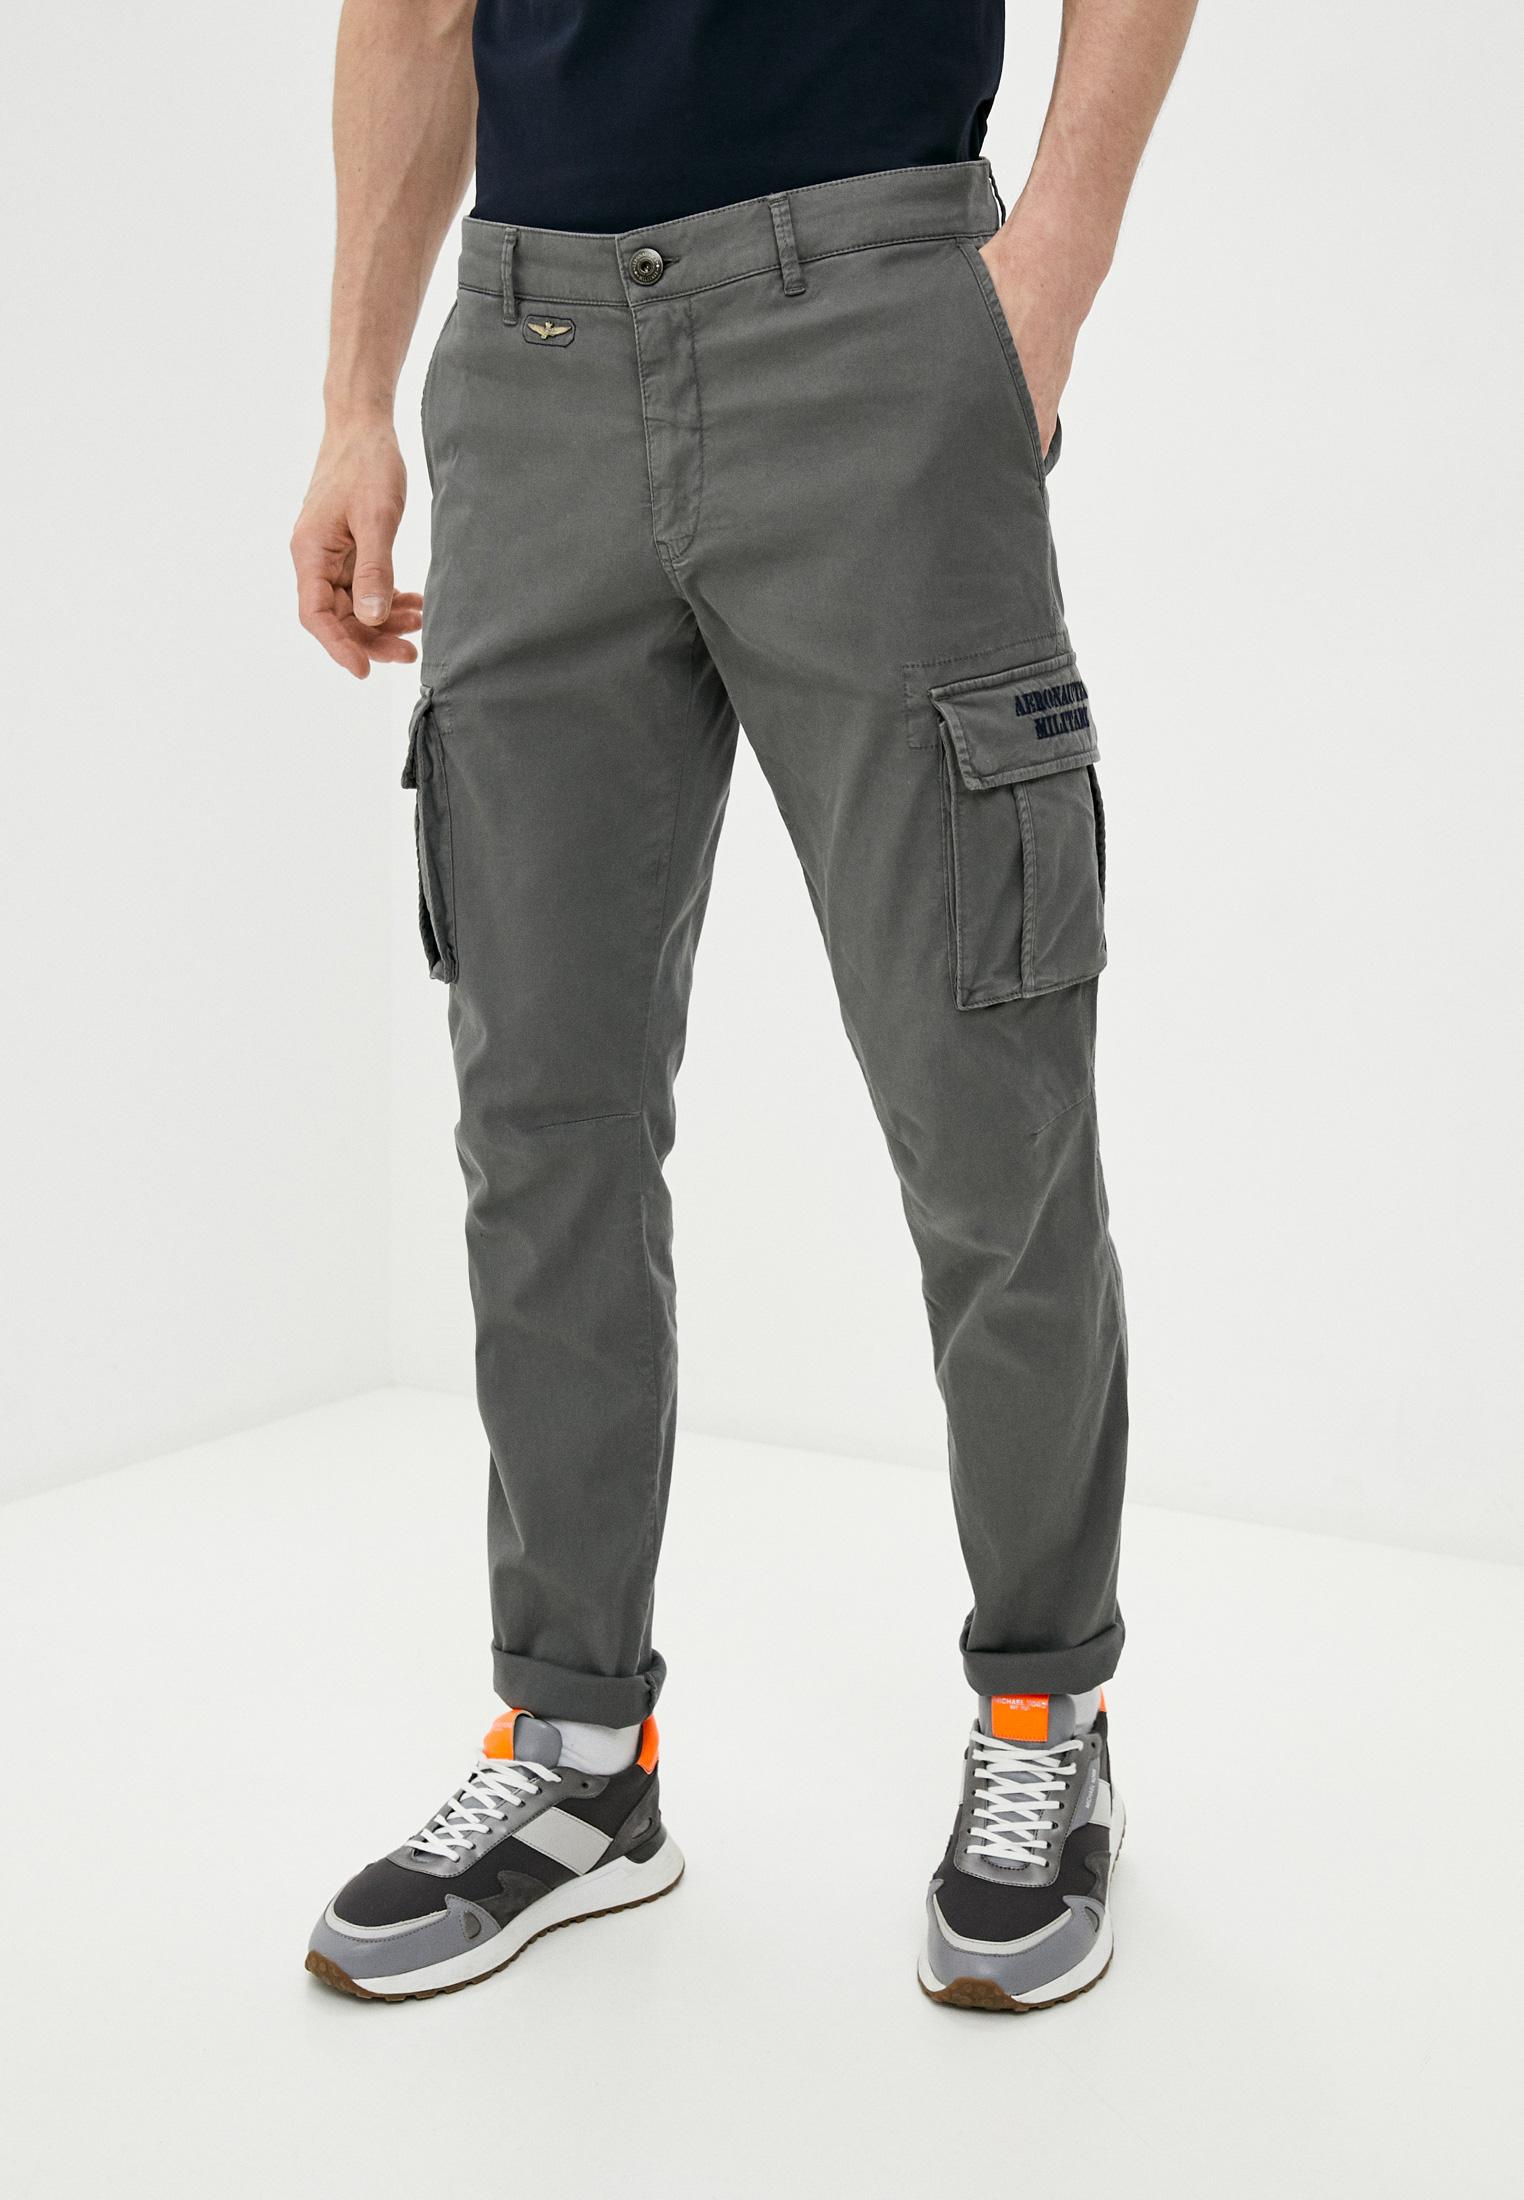 Мужские повседневные брюки Aeronautica Militare Брюки Aeronautica Militare